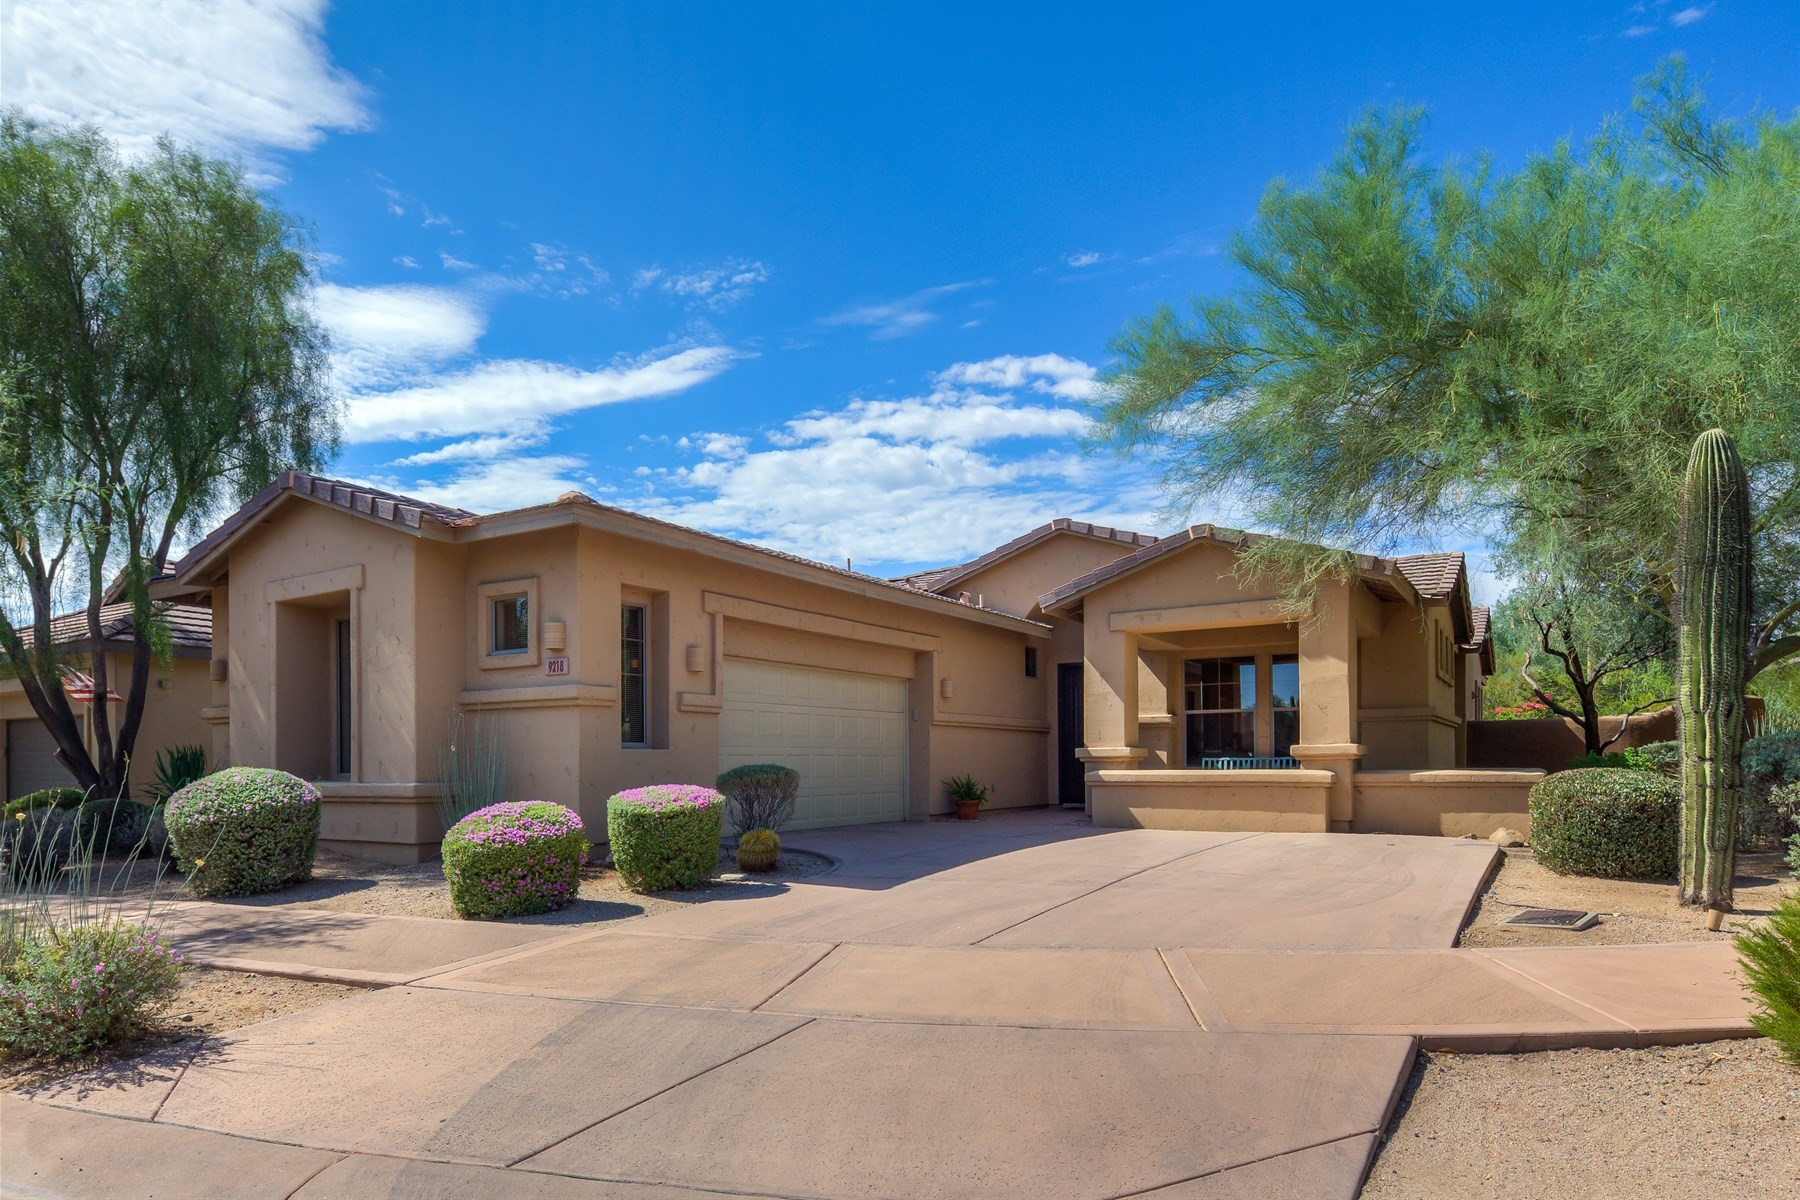 Частный односемейный дом для того Продажа на Lovely modern Scottsdale home in DC Ranch 9218 E Rusty Spur Pl Scottsdale, Аризона, 85255 Соединенные Штаты